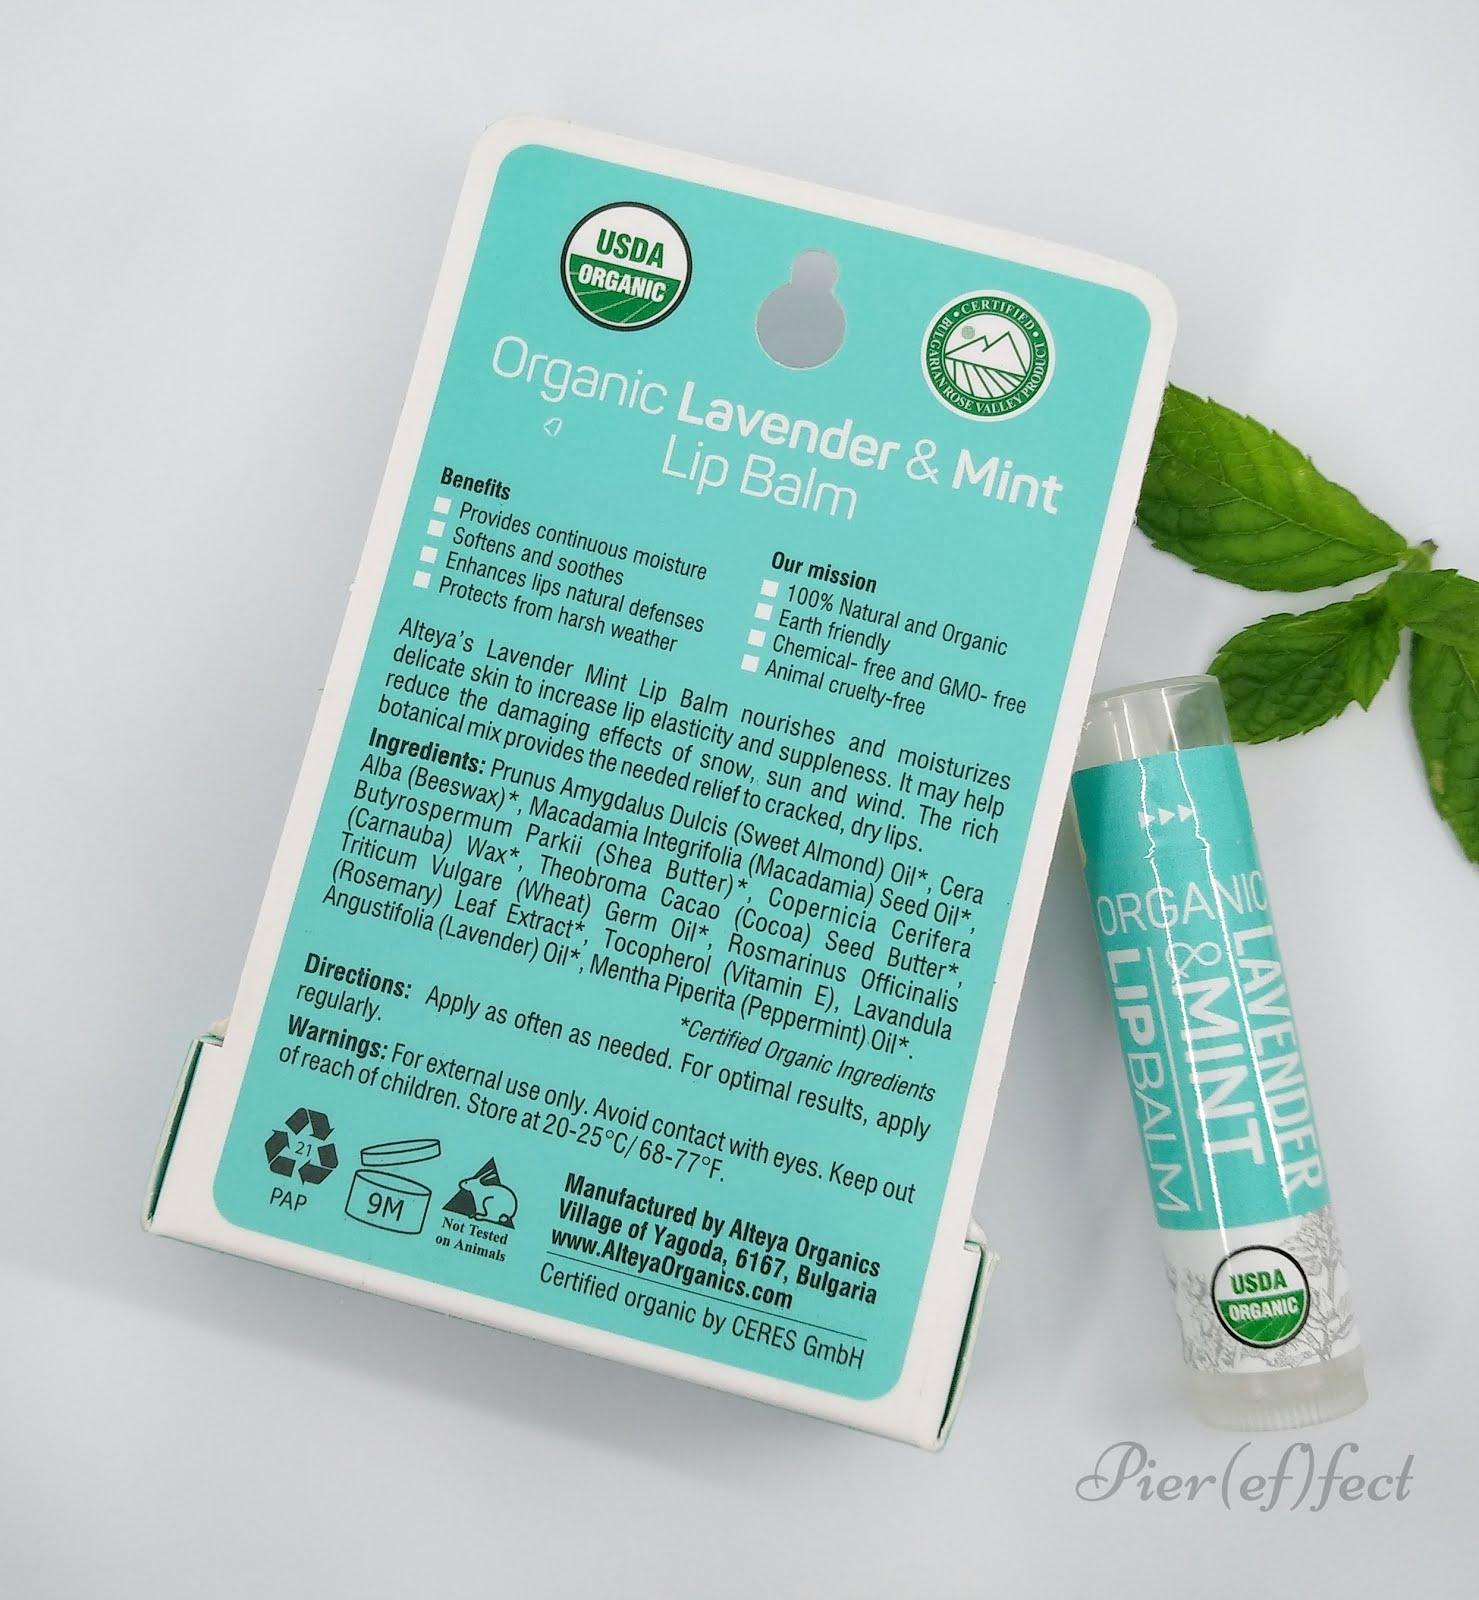 recensione alteya organics balsamo labbra amazon